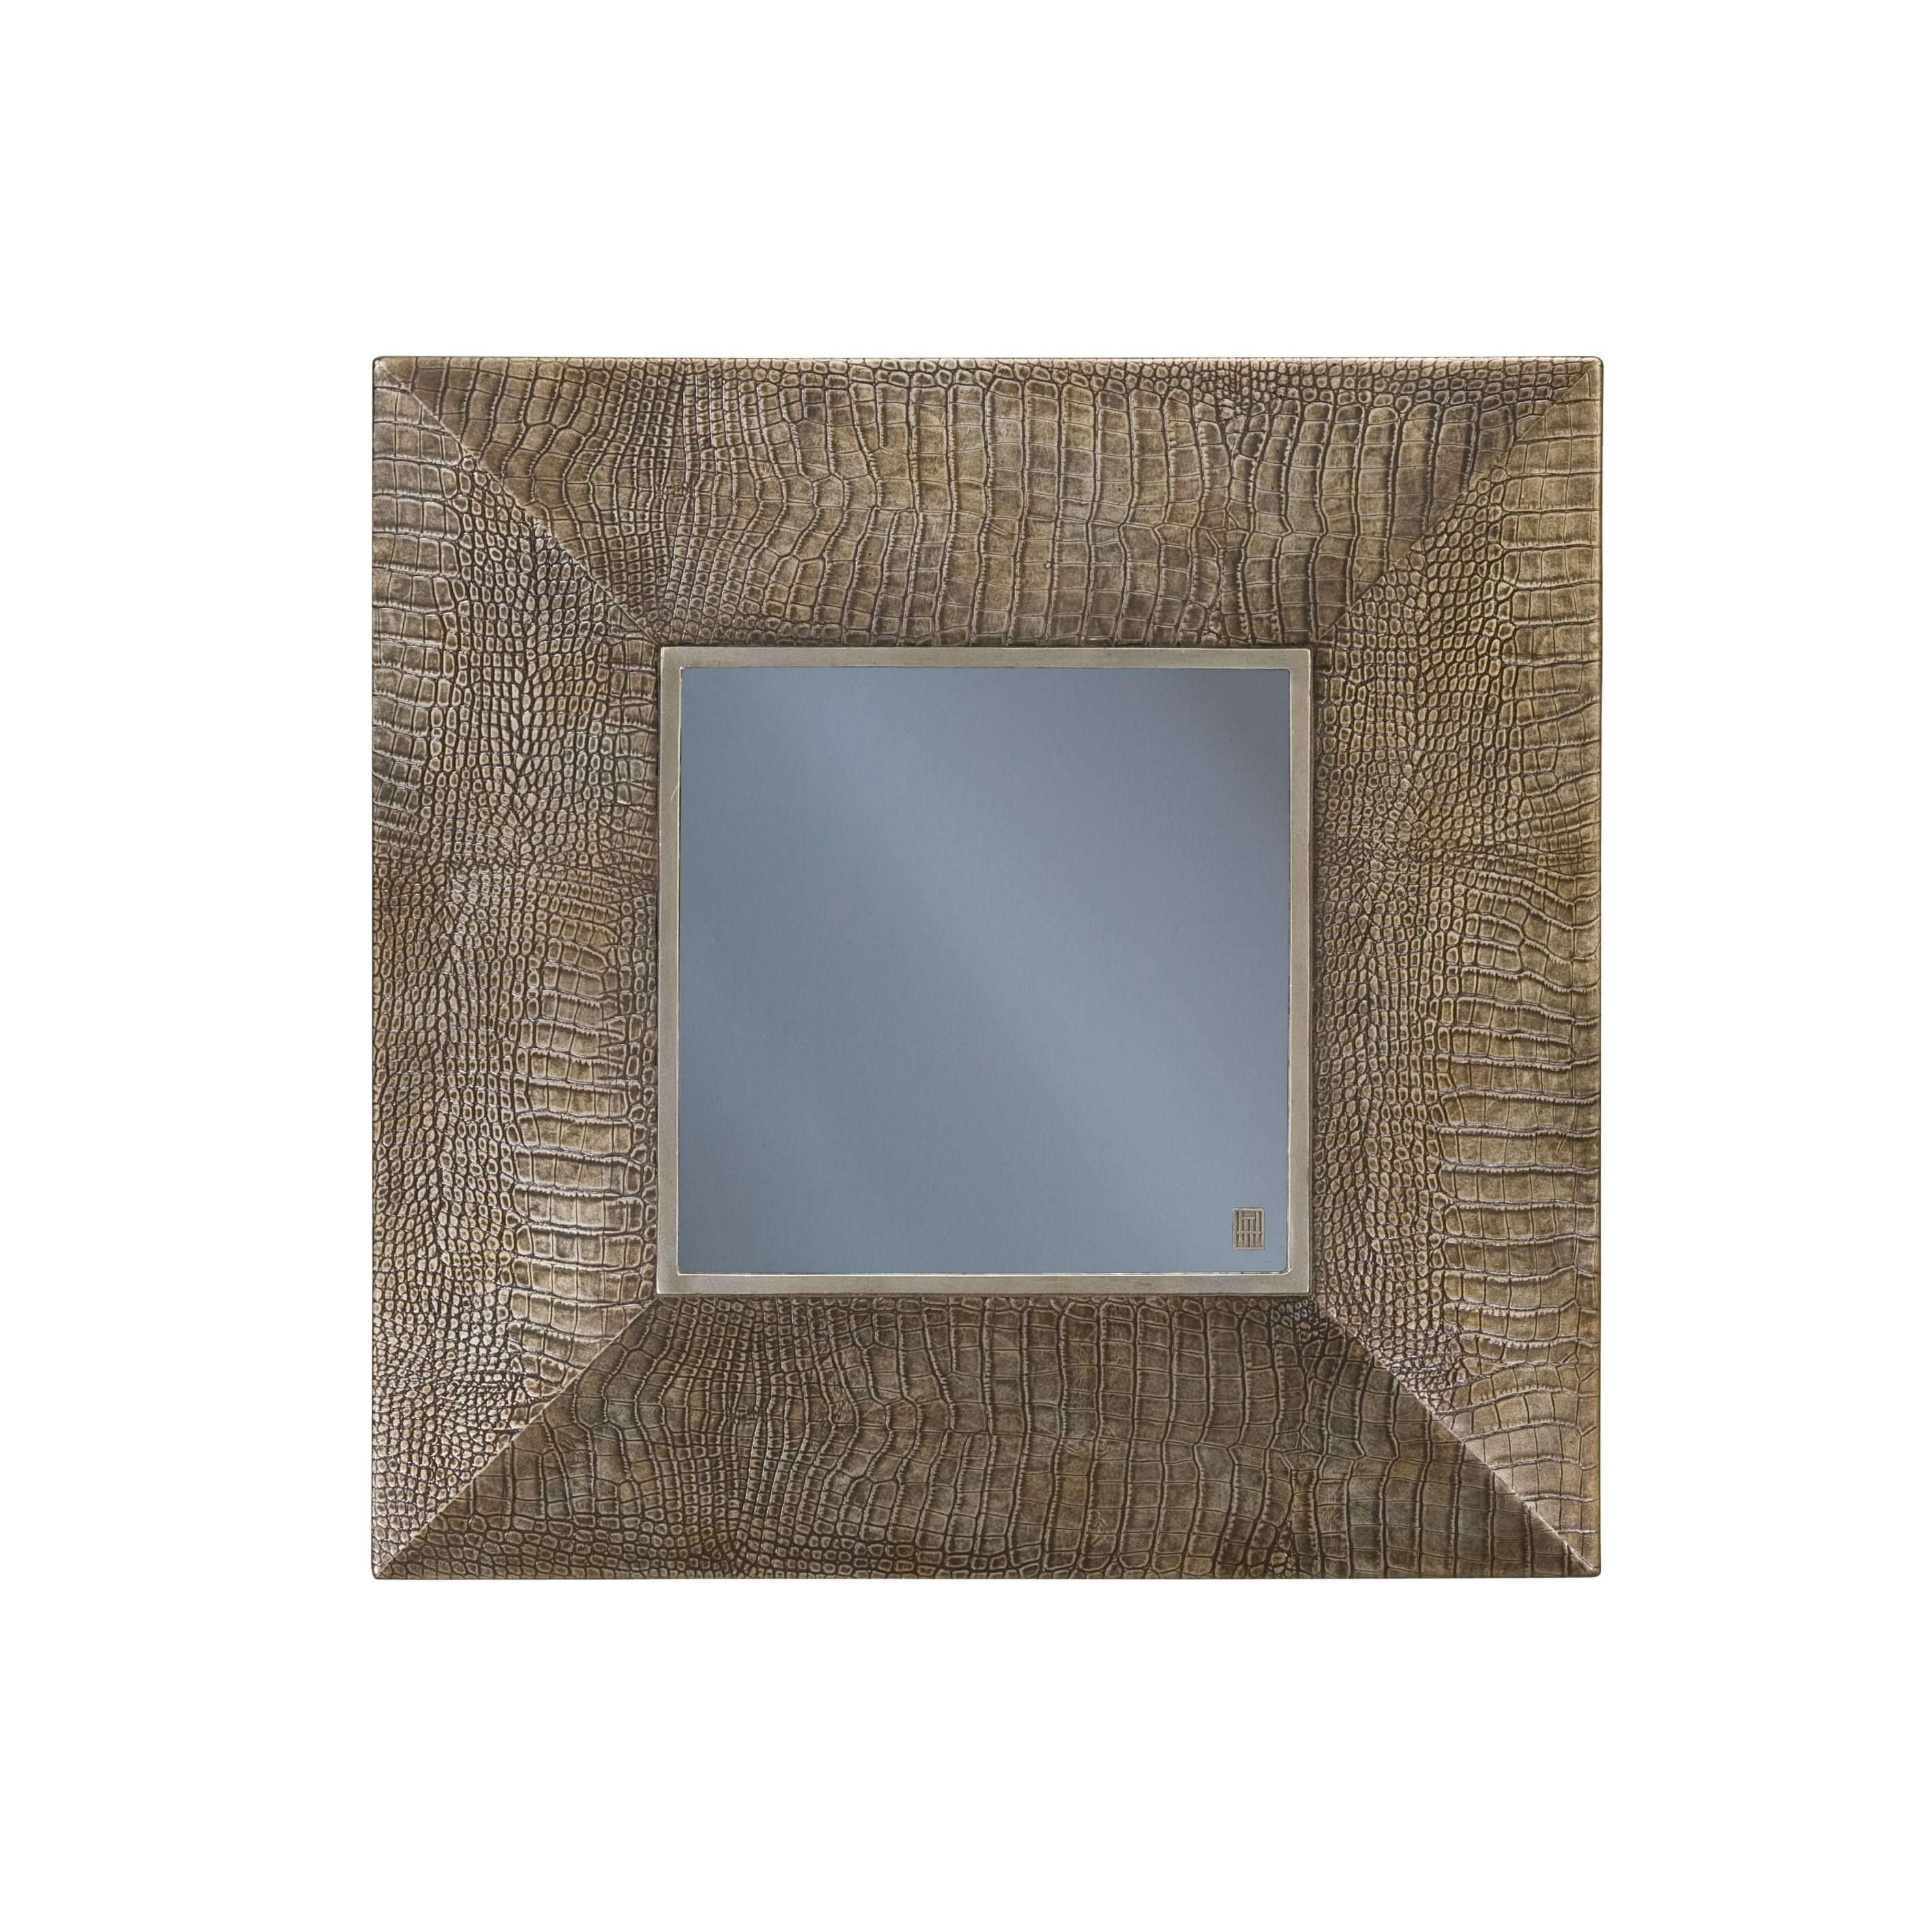 Adriana Hoyos Signature Square Small #Mirror #home #accessories #luxury  #contemporary #furniture